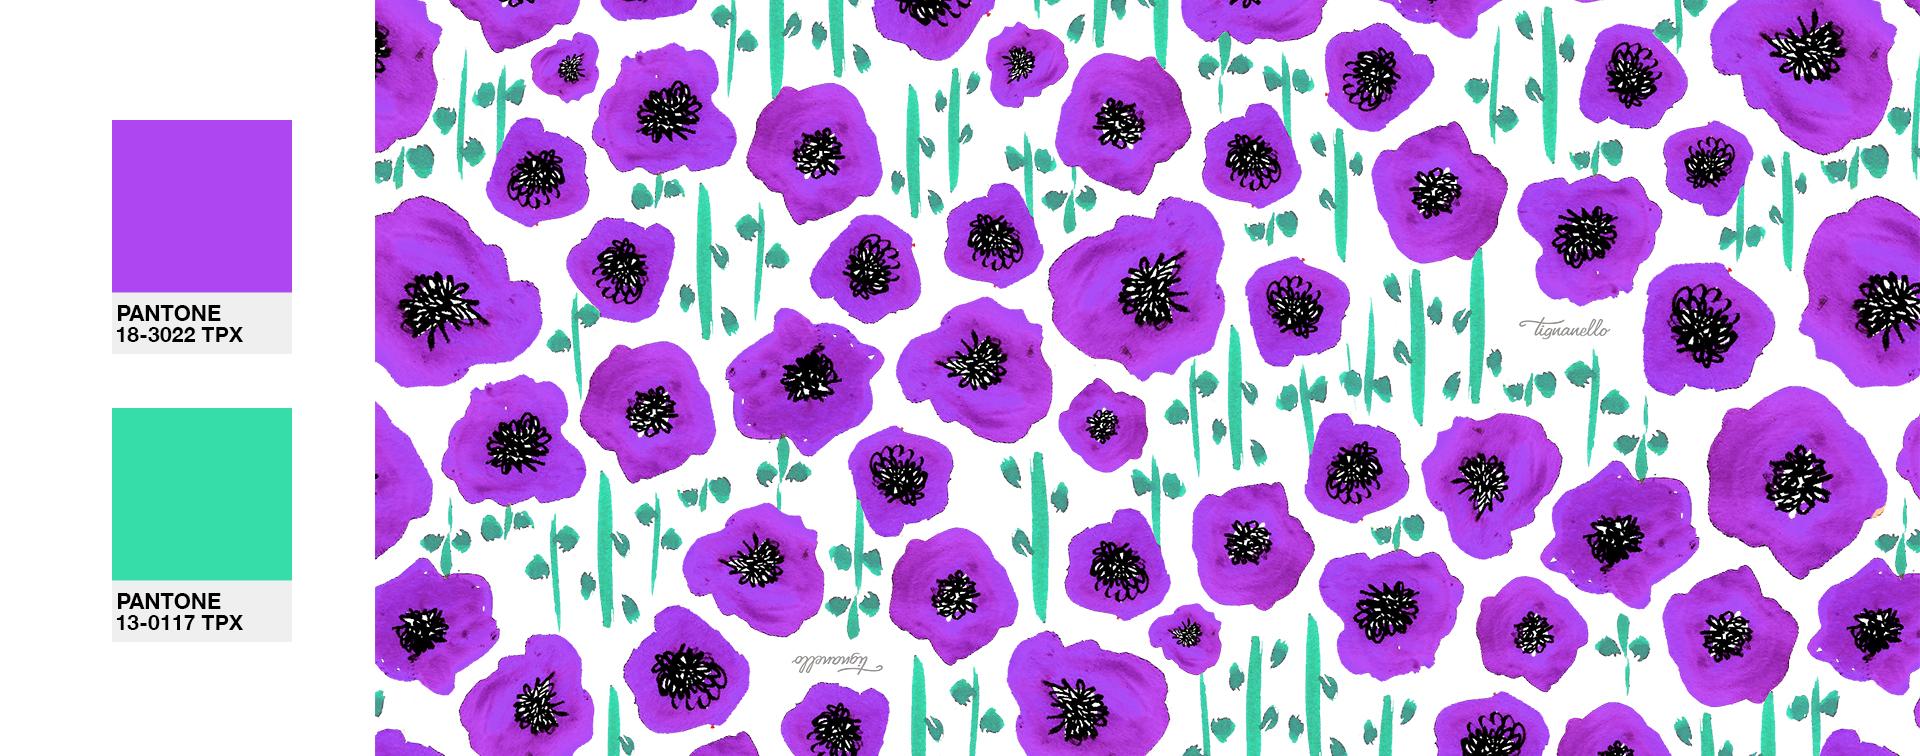 pantone-poppies-purp